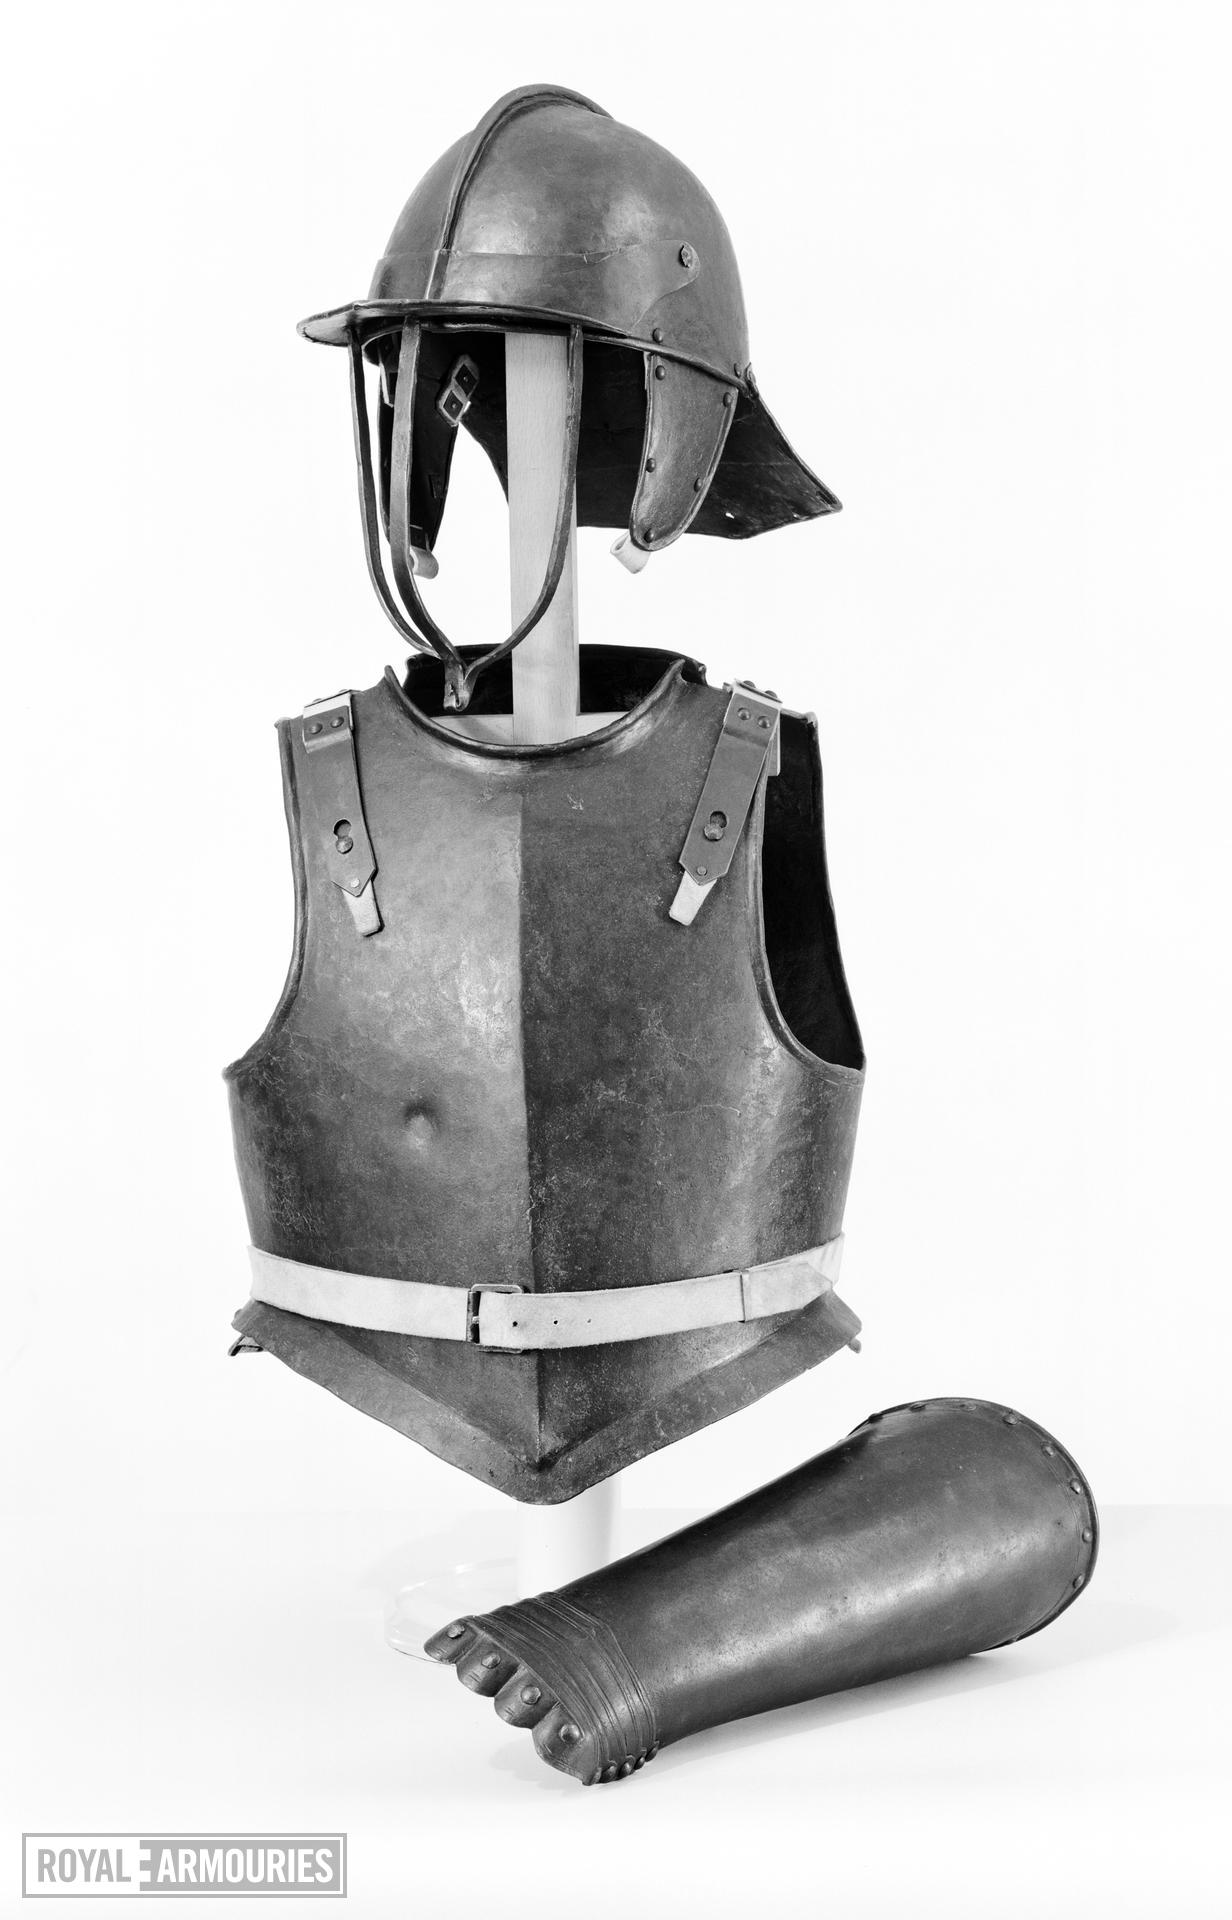 Harquebusier's armour